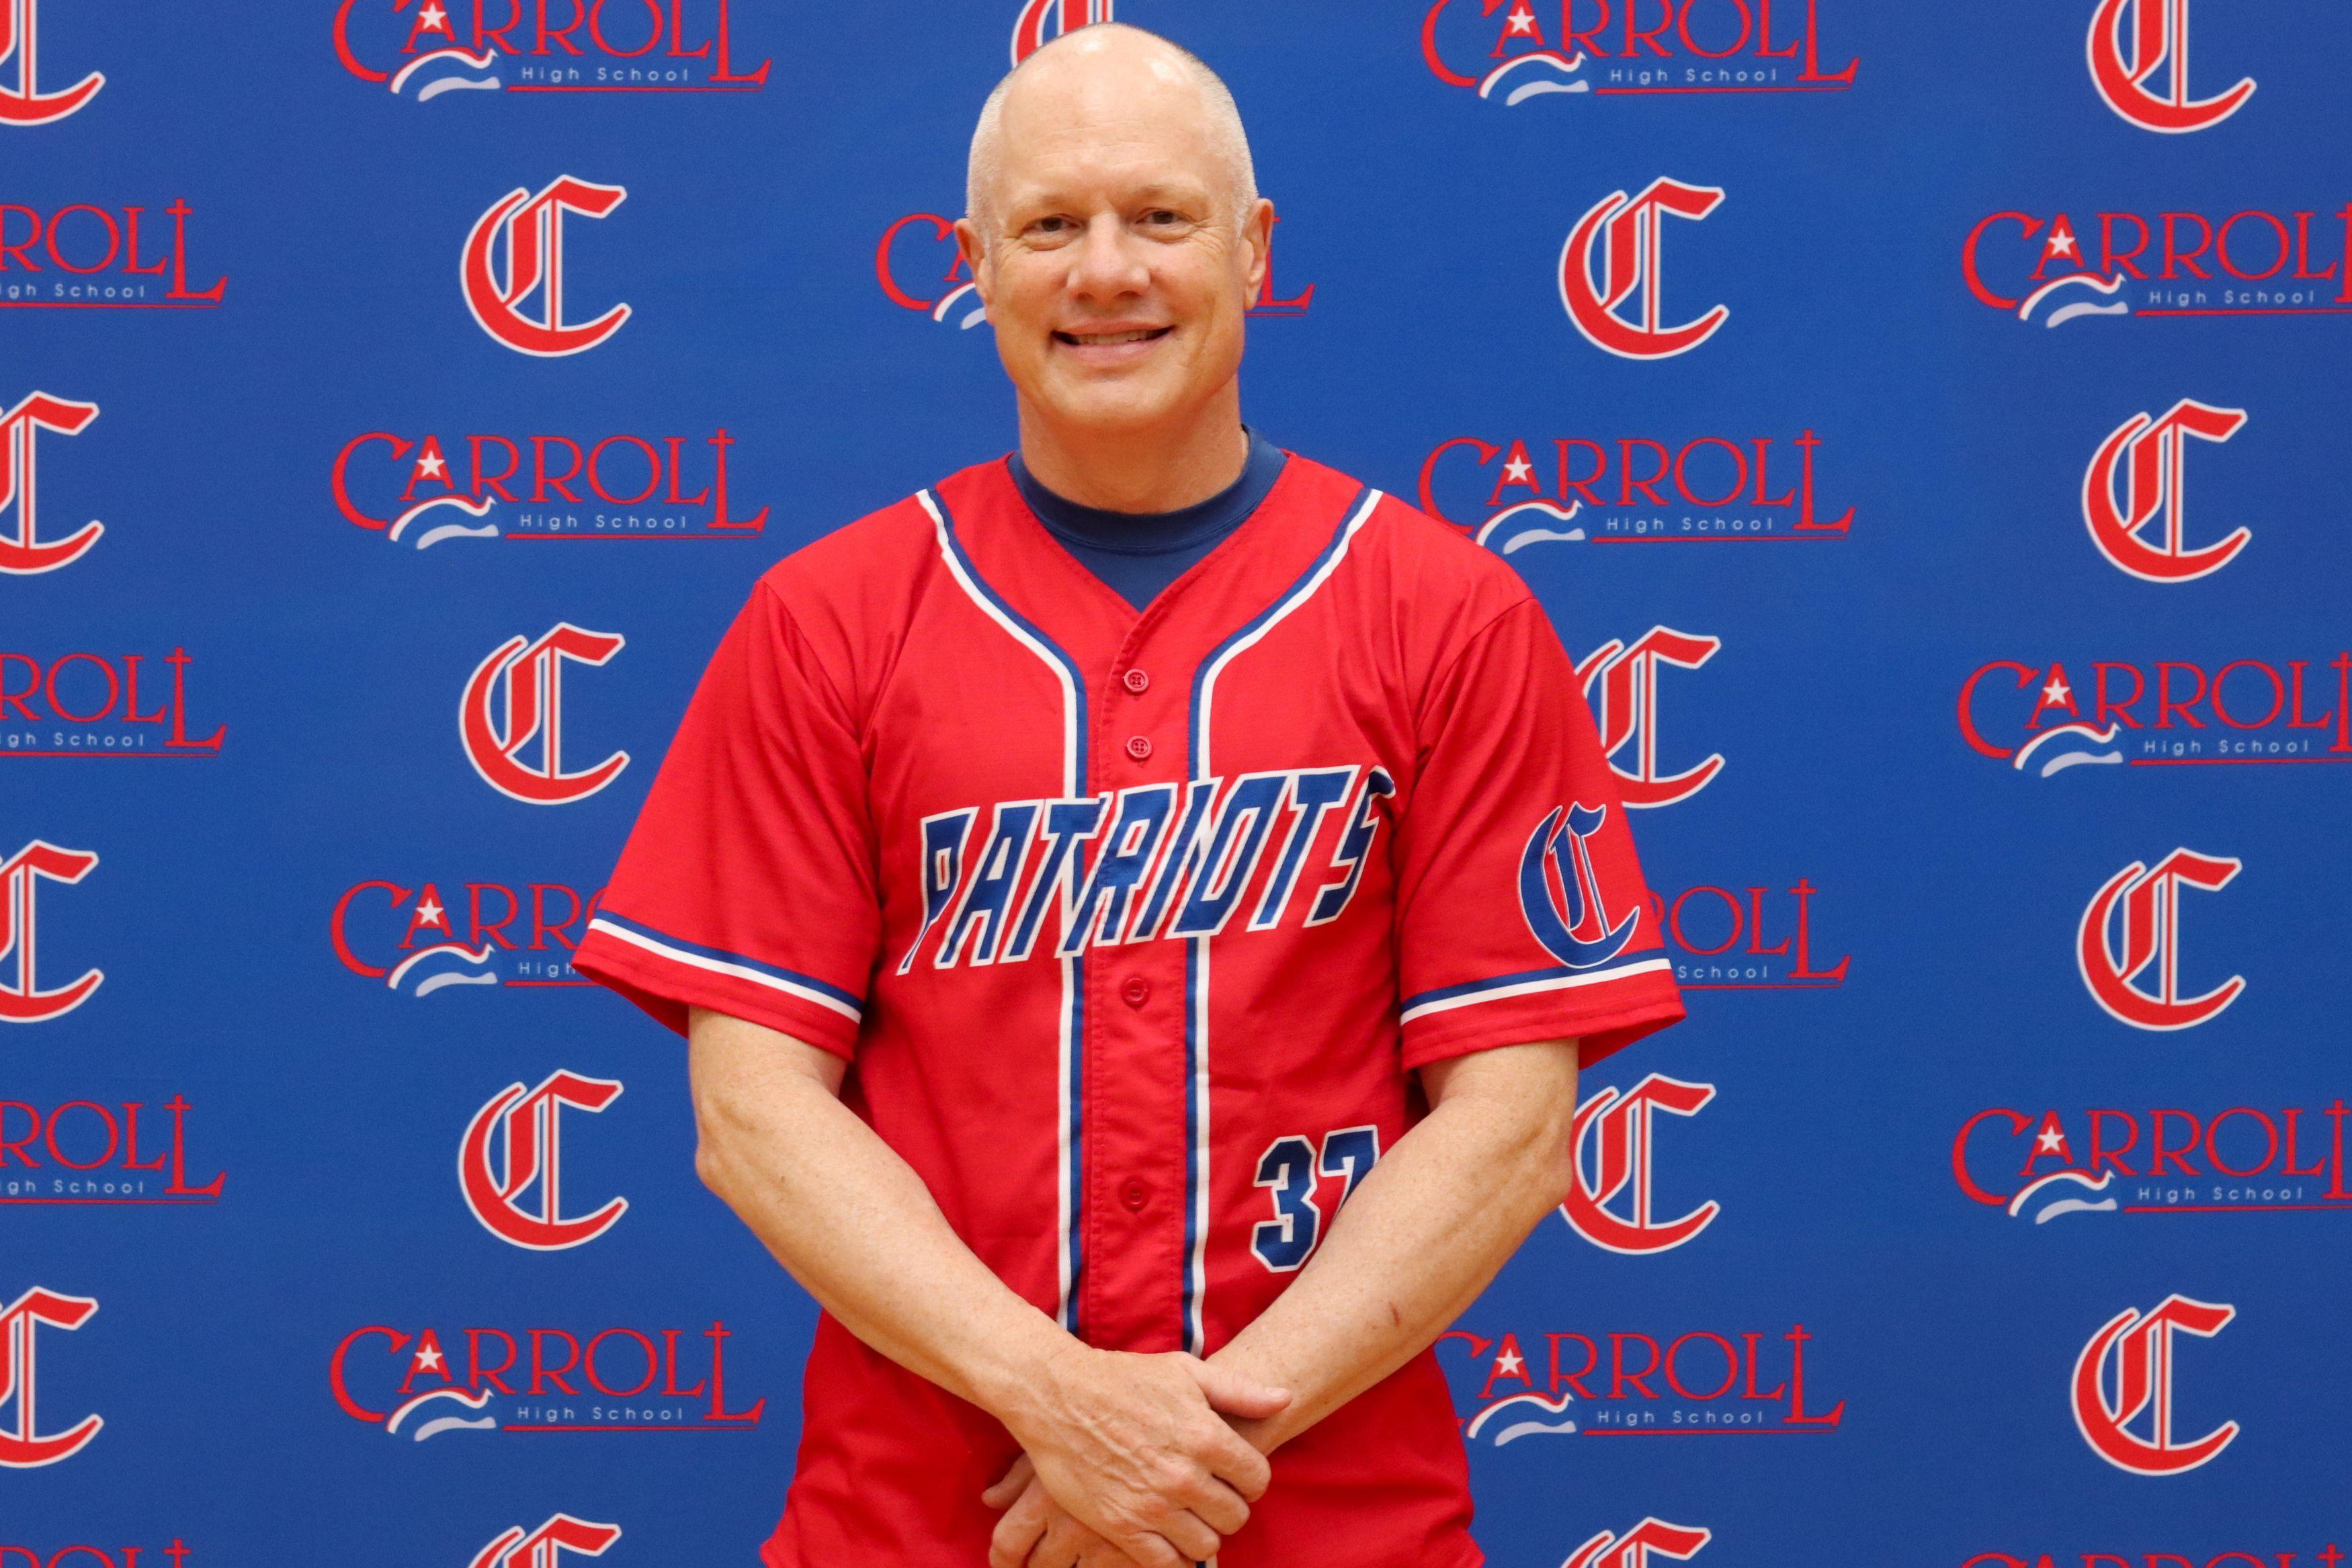 Carroll Baseball Head Coach TR Smart